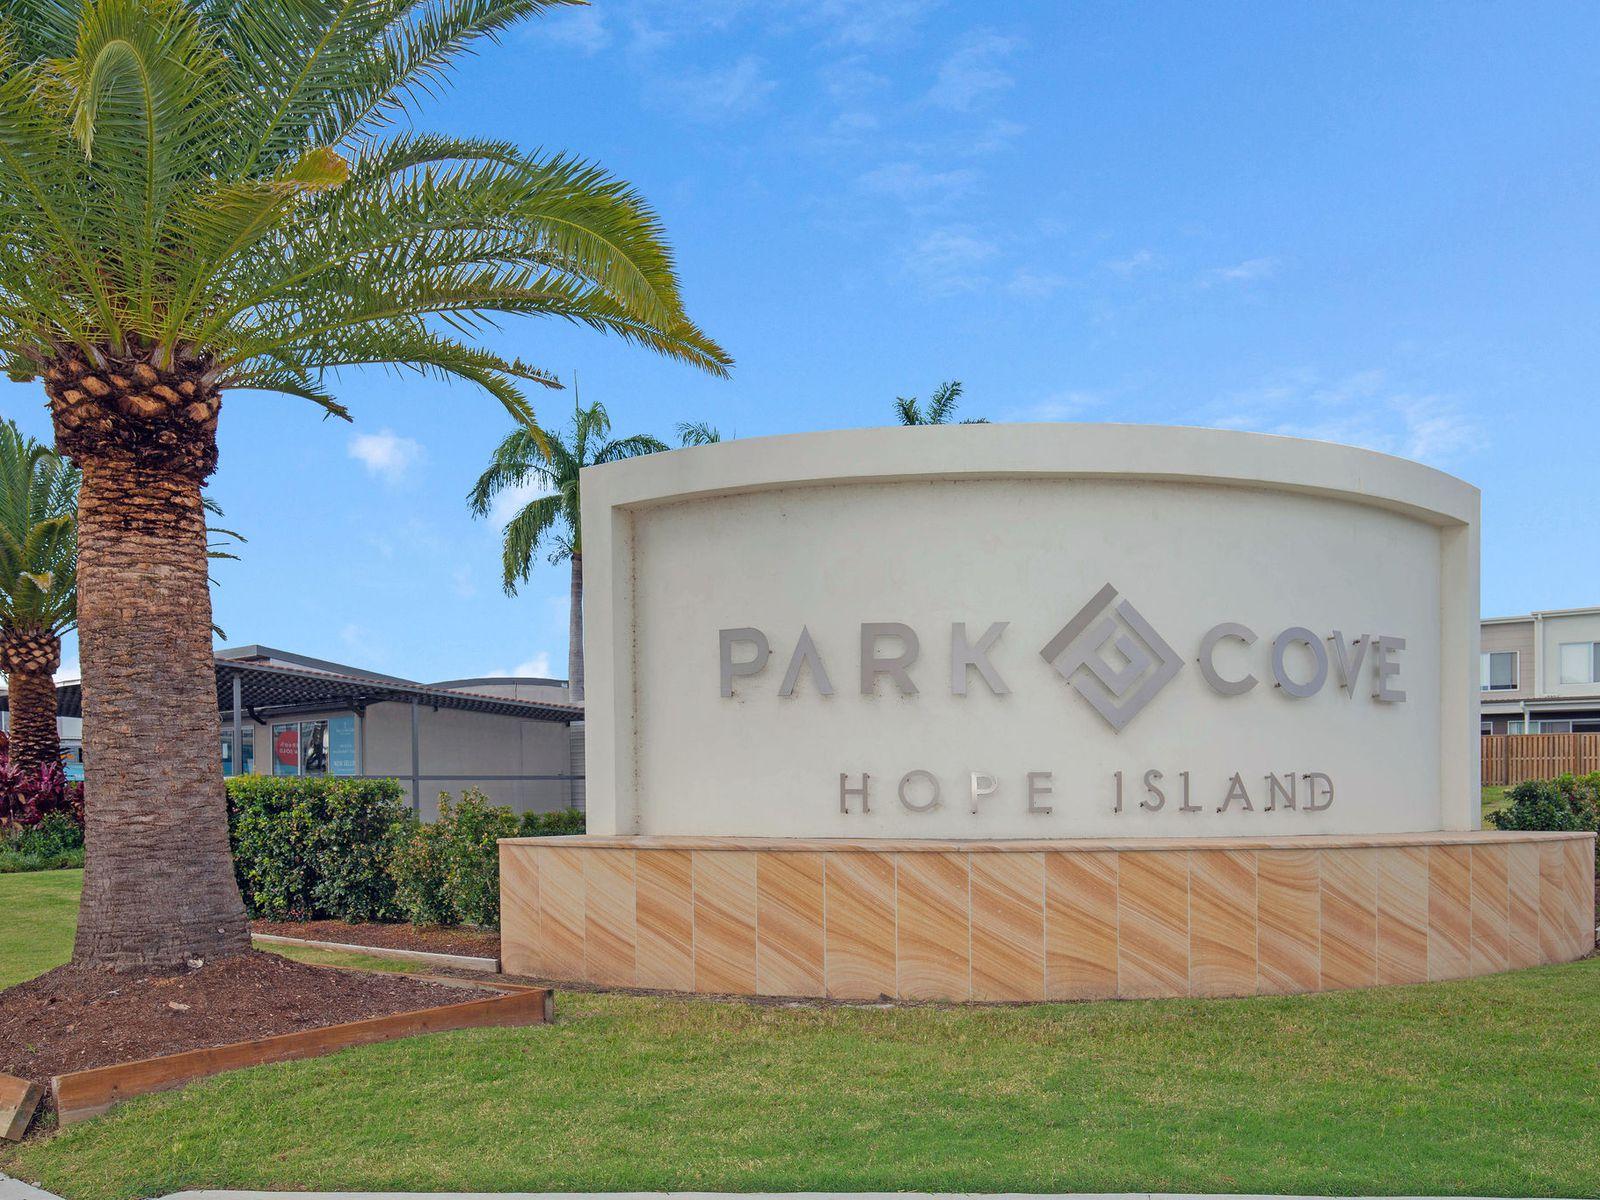 15 / 6 Park Cove Blvd, Hope Island